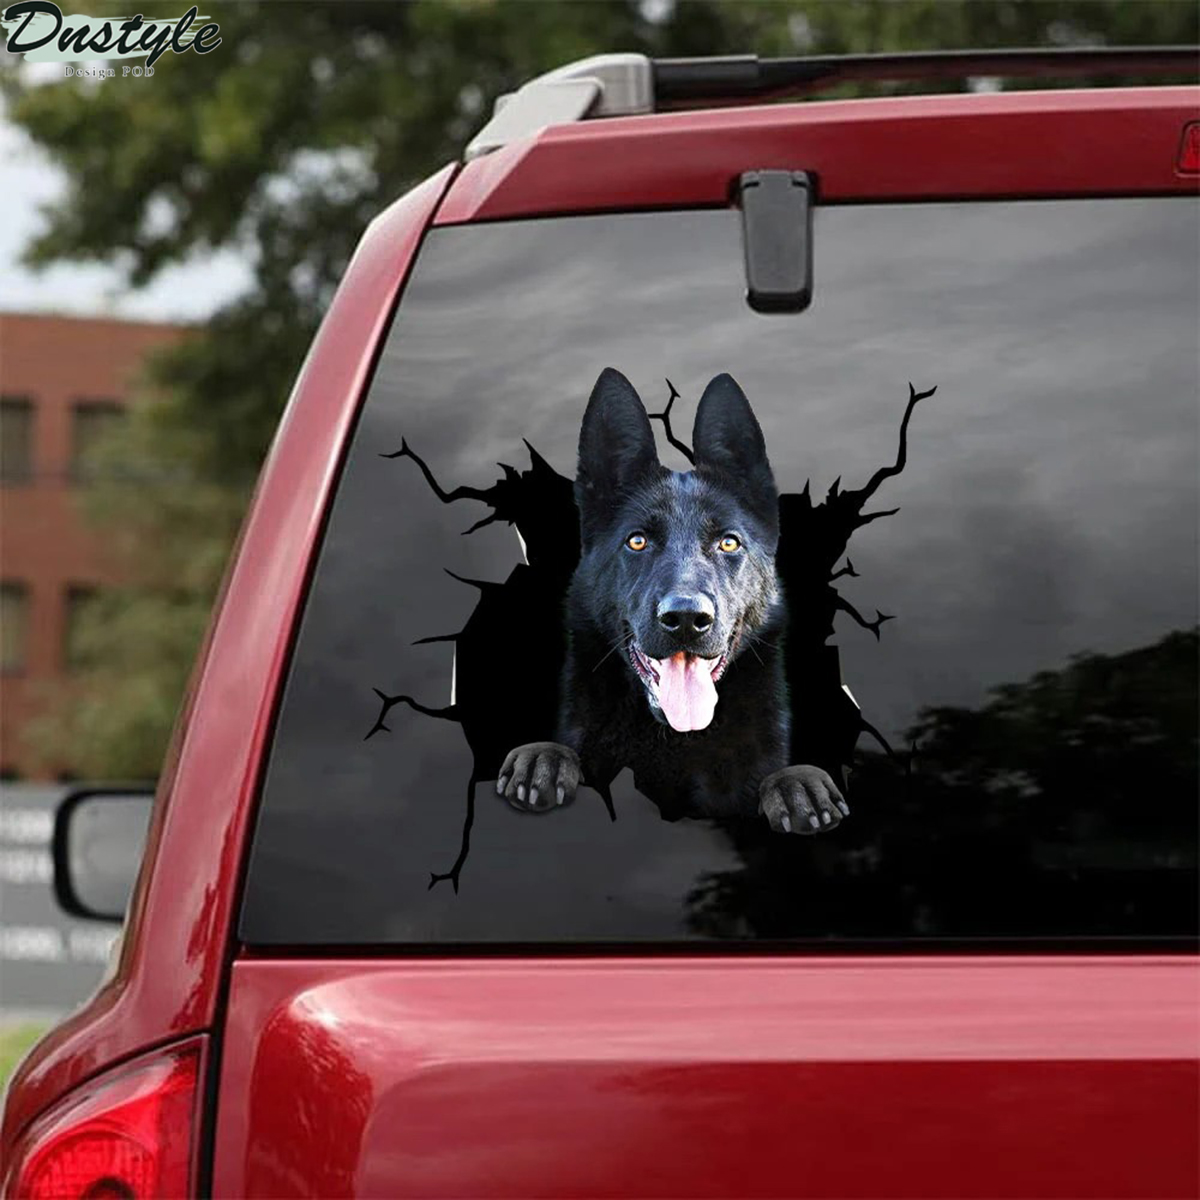 German shepherd crack car decal sticker 1